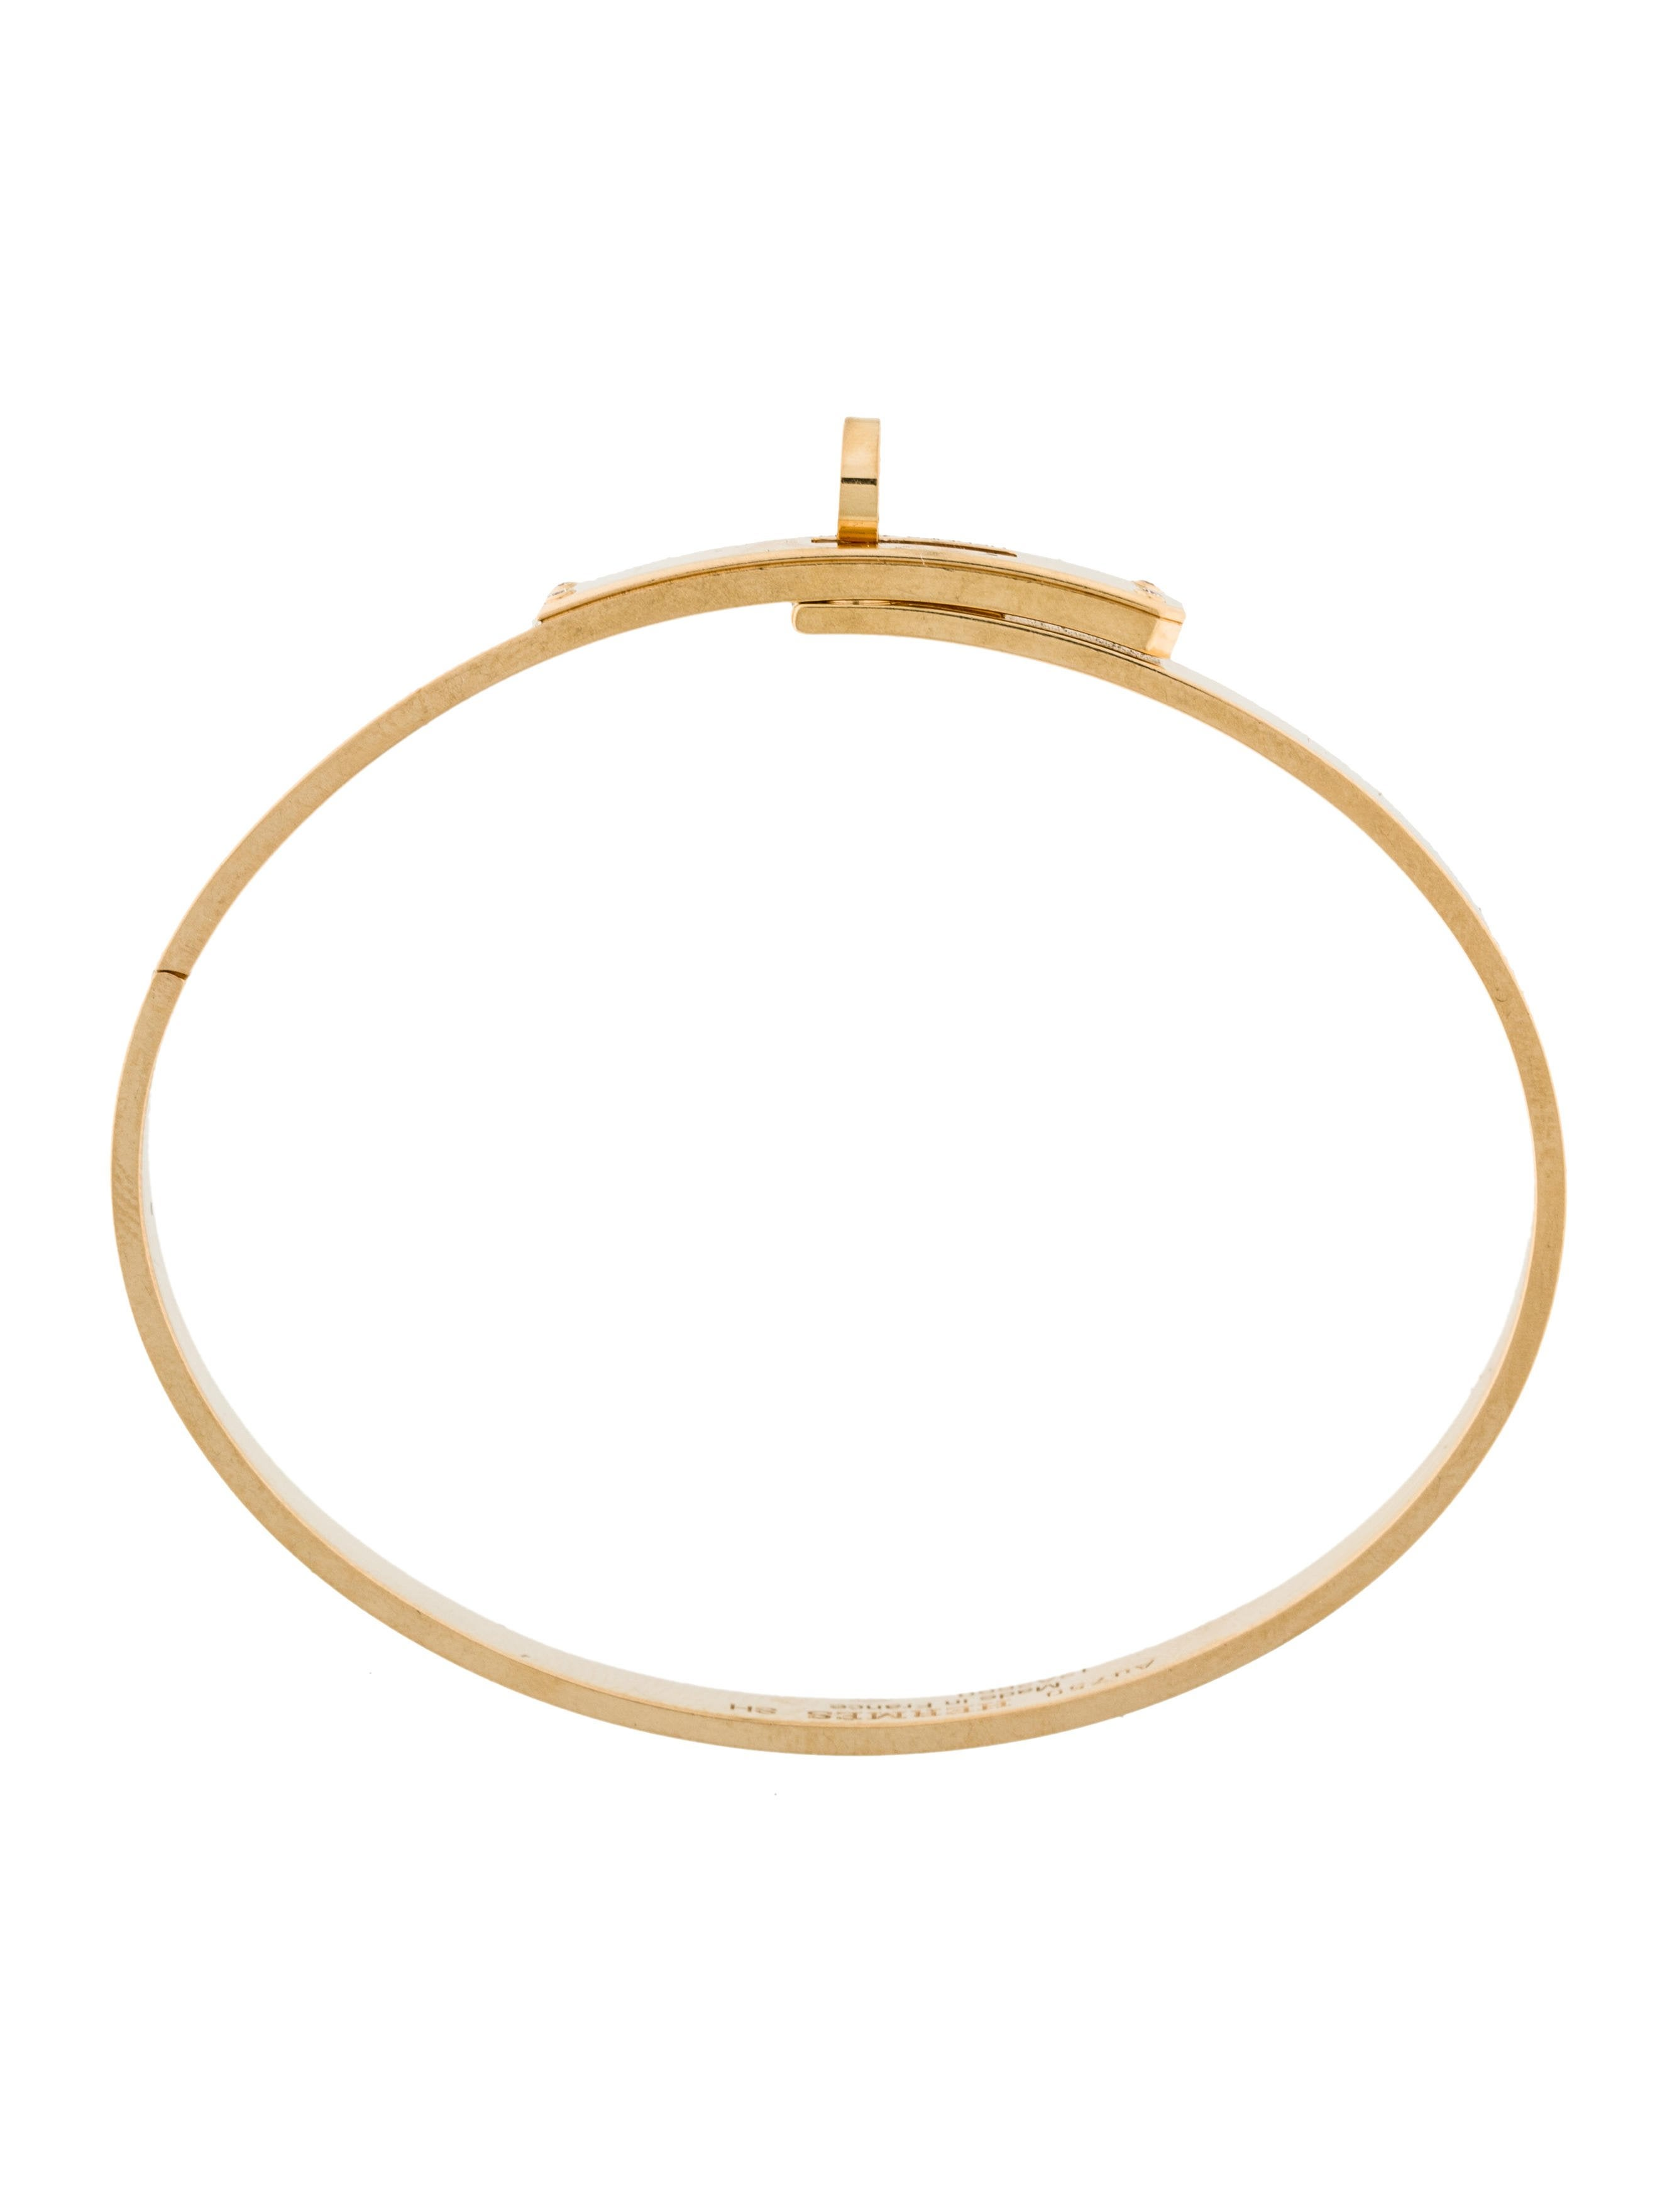 herm s 18k diamond kelly bangle bracelet bracelets. Black Bedroom Furniture Sets. Home Design Ideas